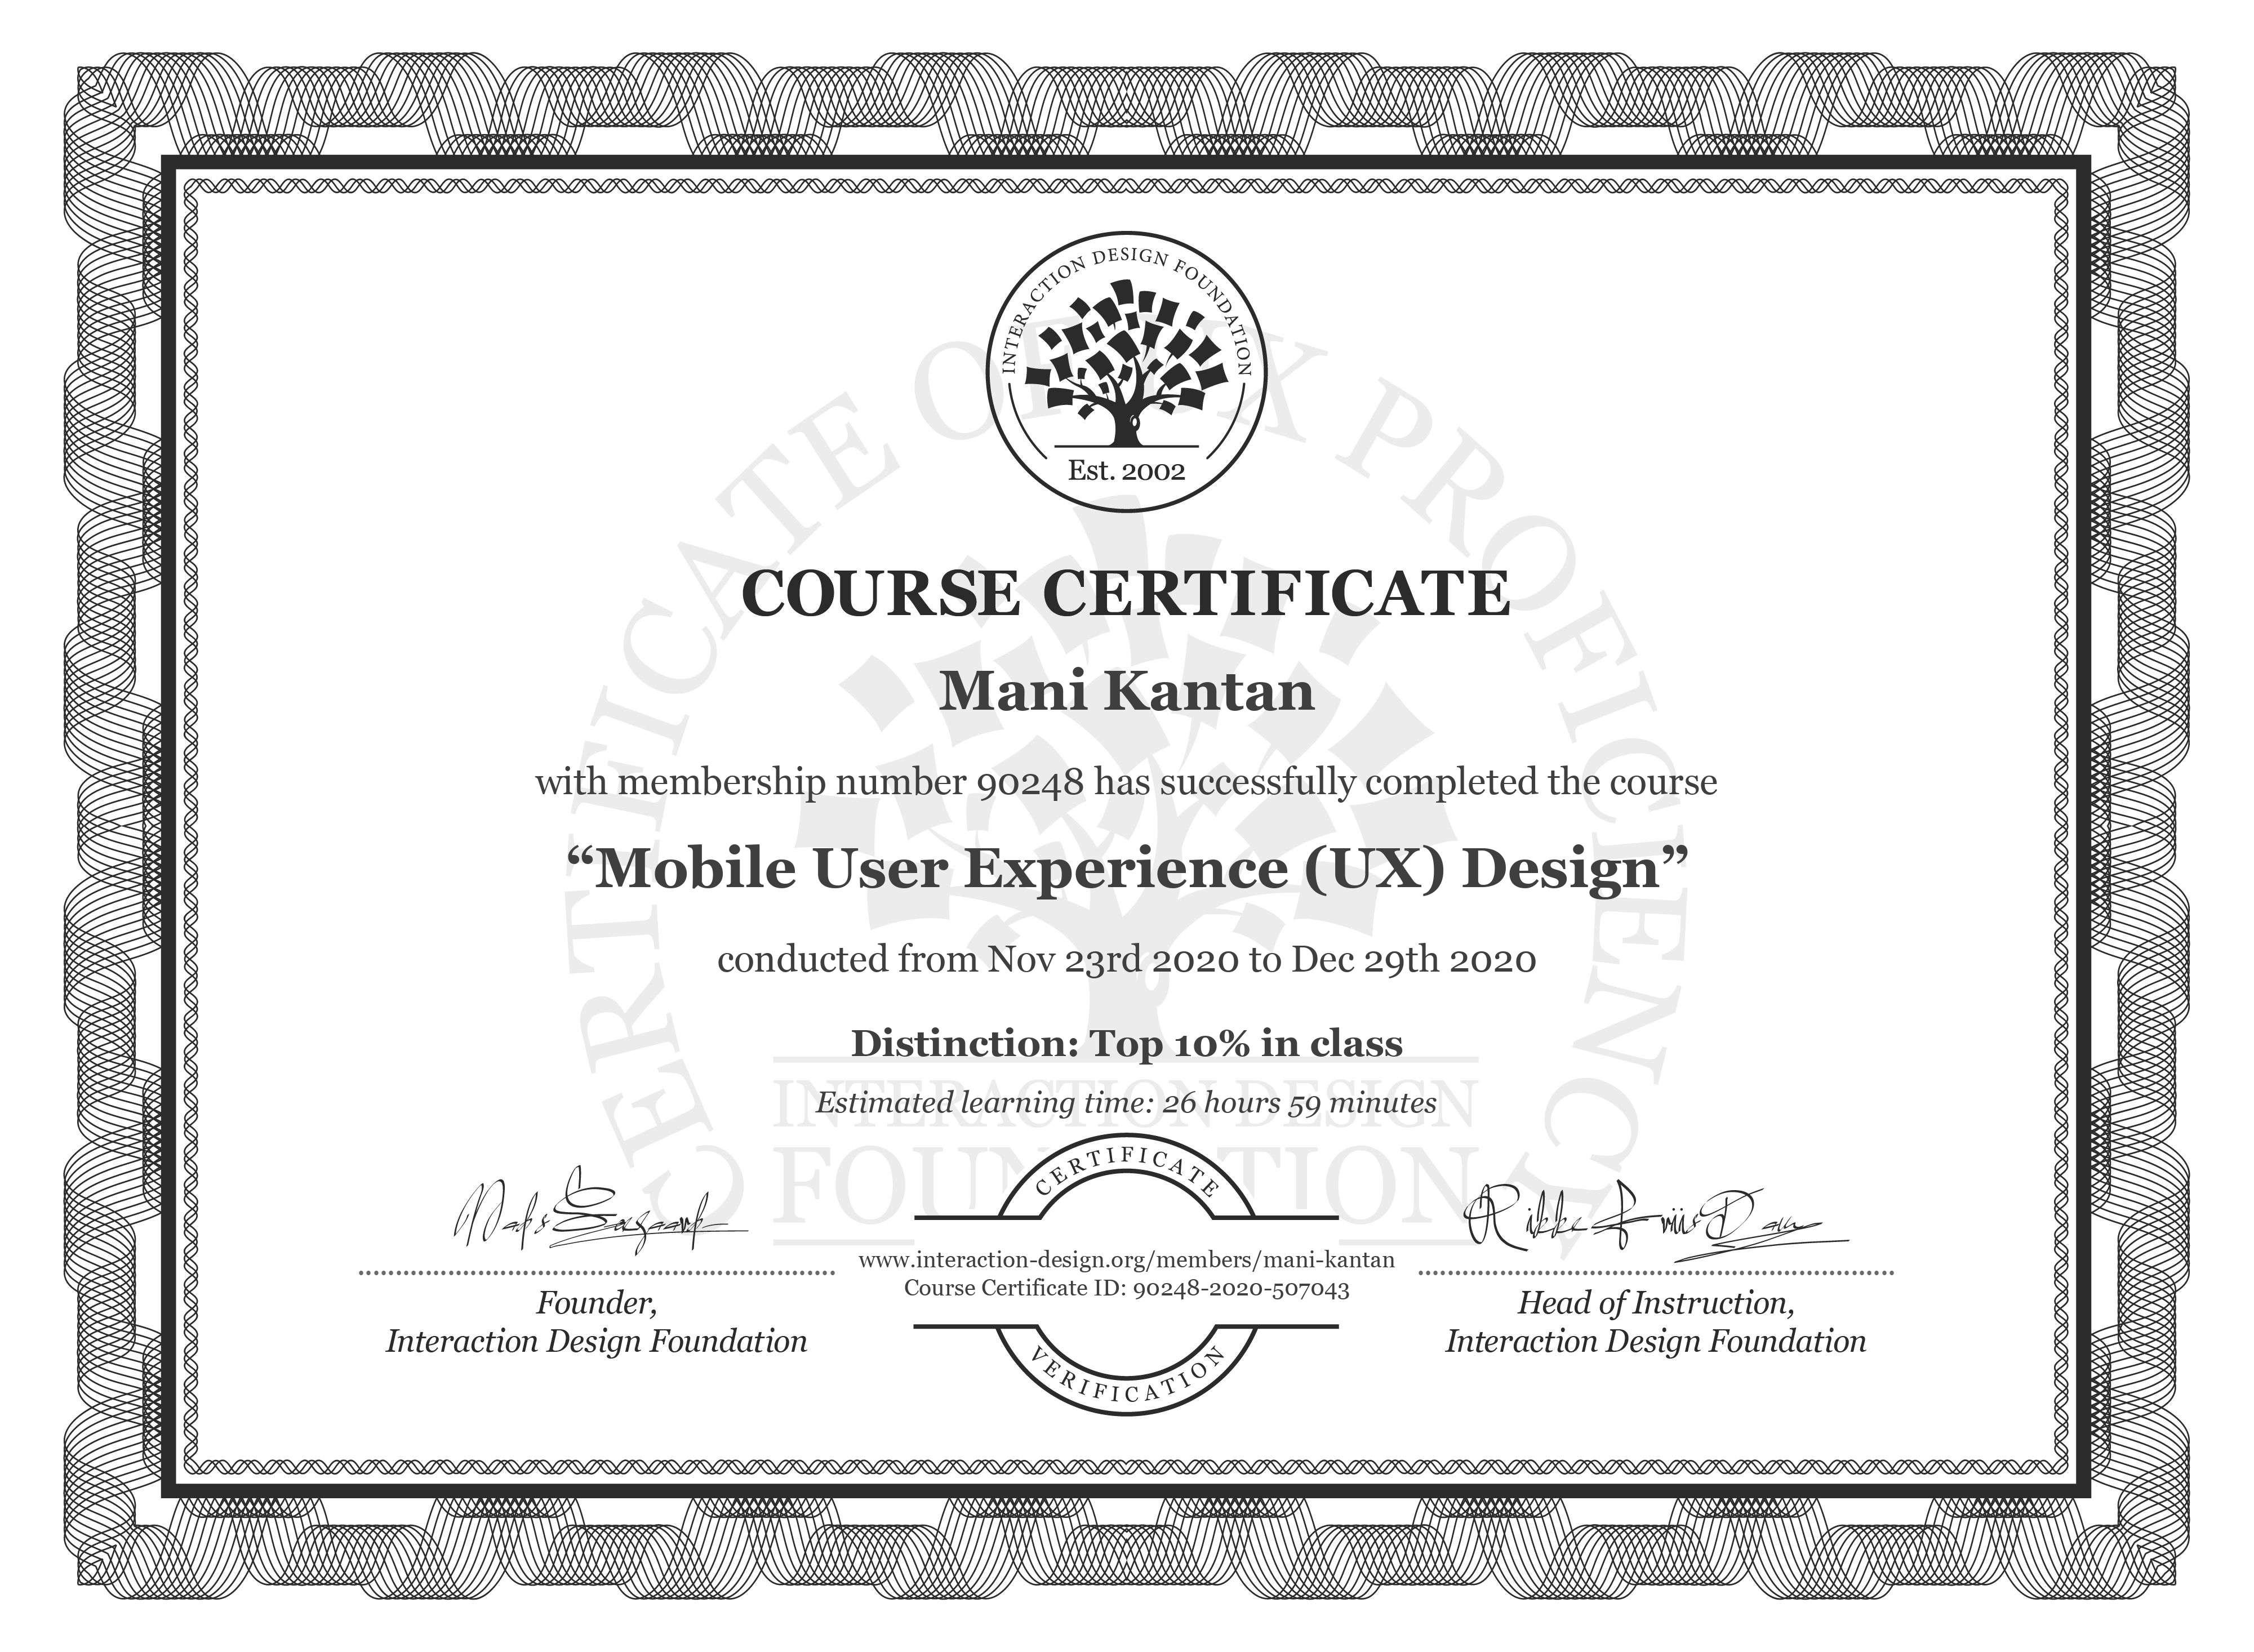 Mani Kantan's Course Certificate: Mobile User Experience (UX) Design